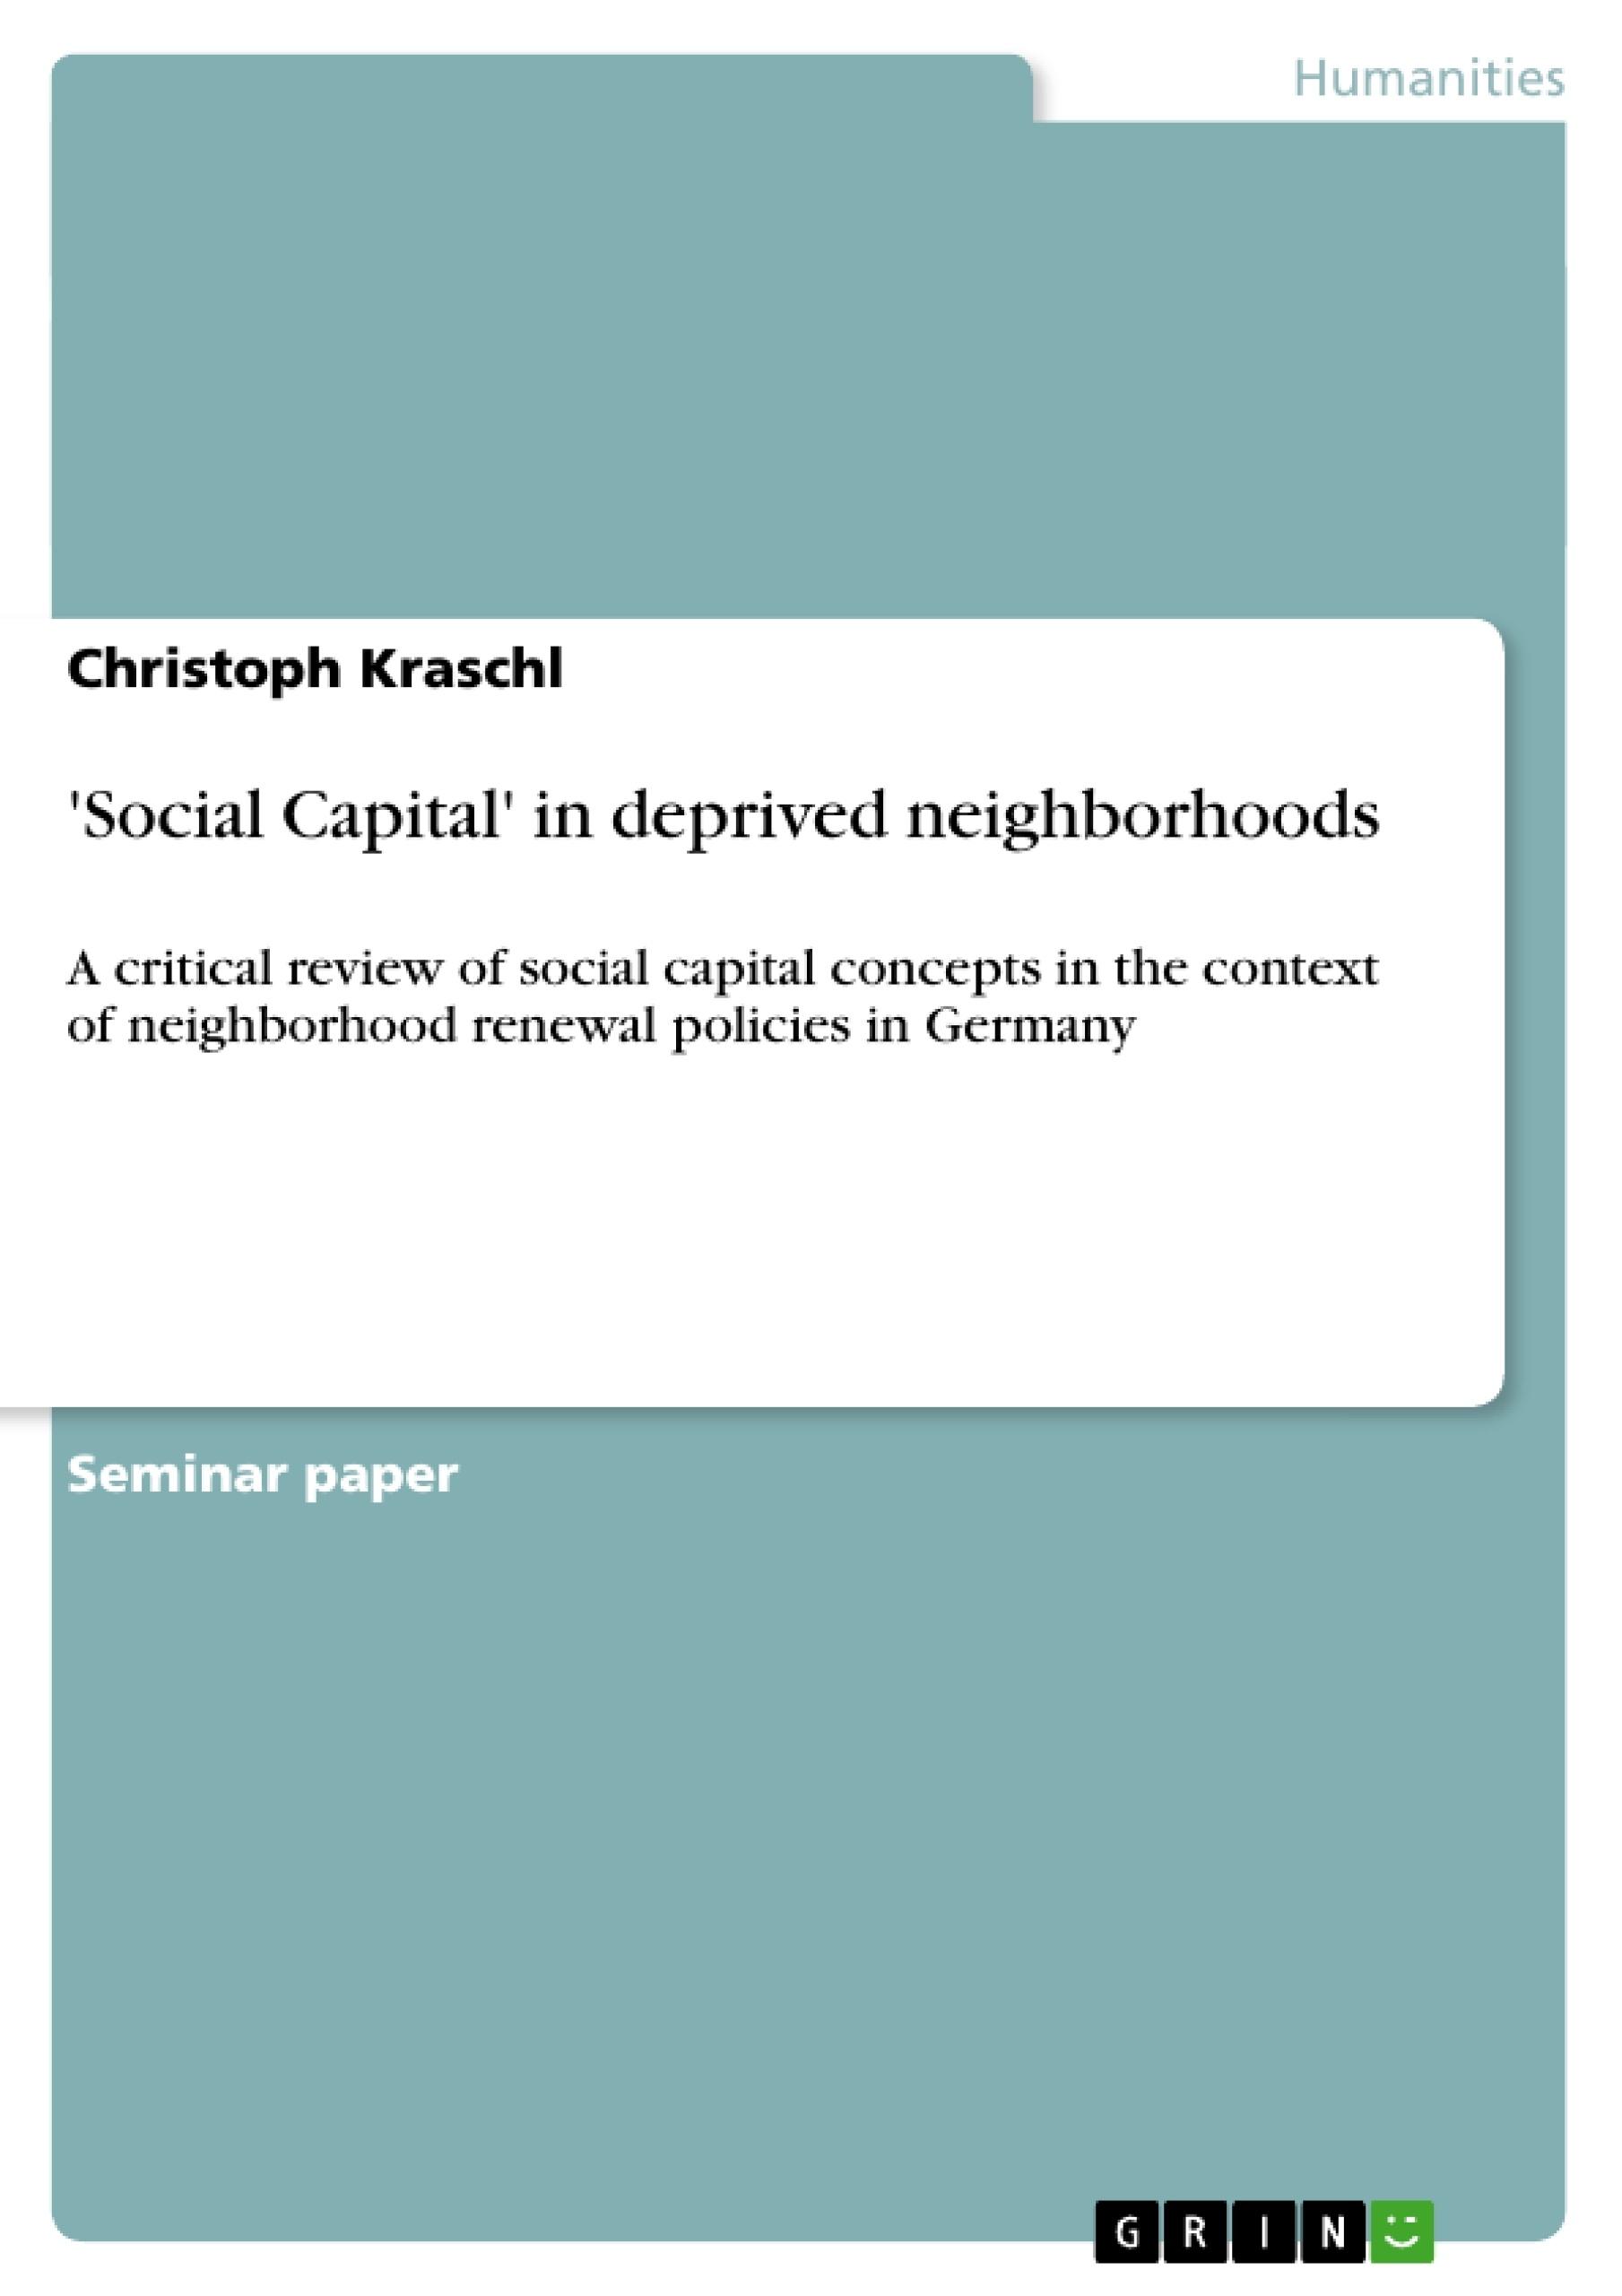 Title: 'Social Capital' in deprived neighborhoods